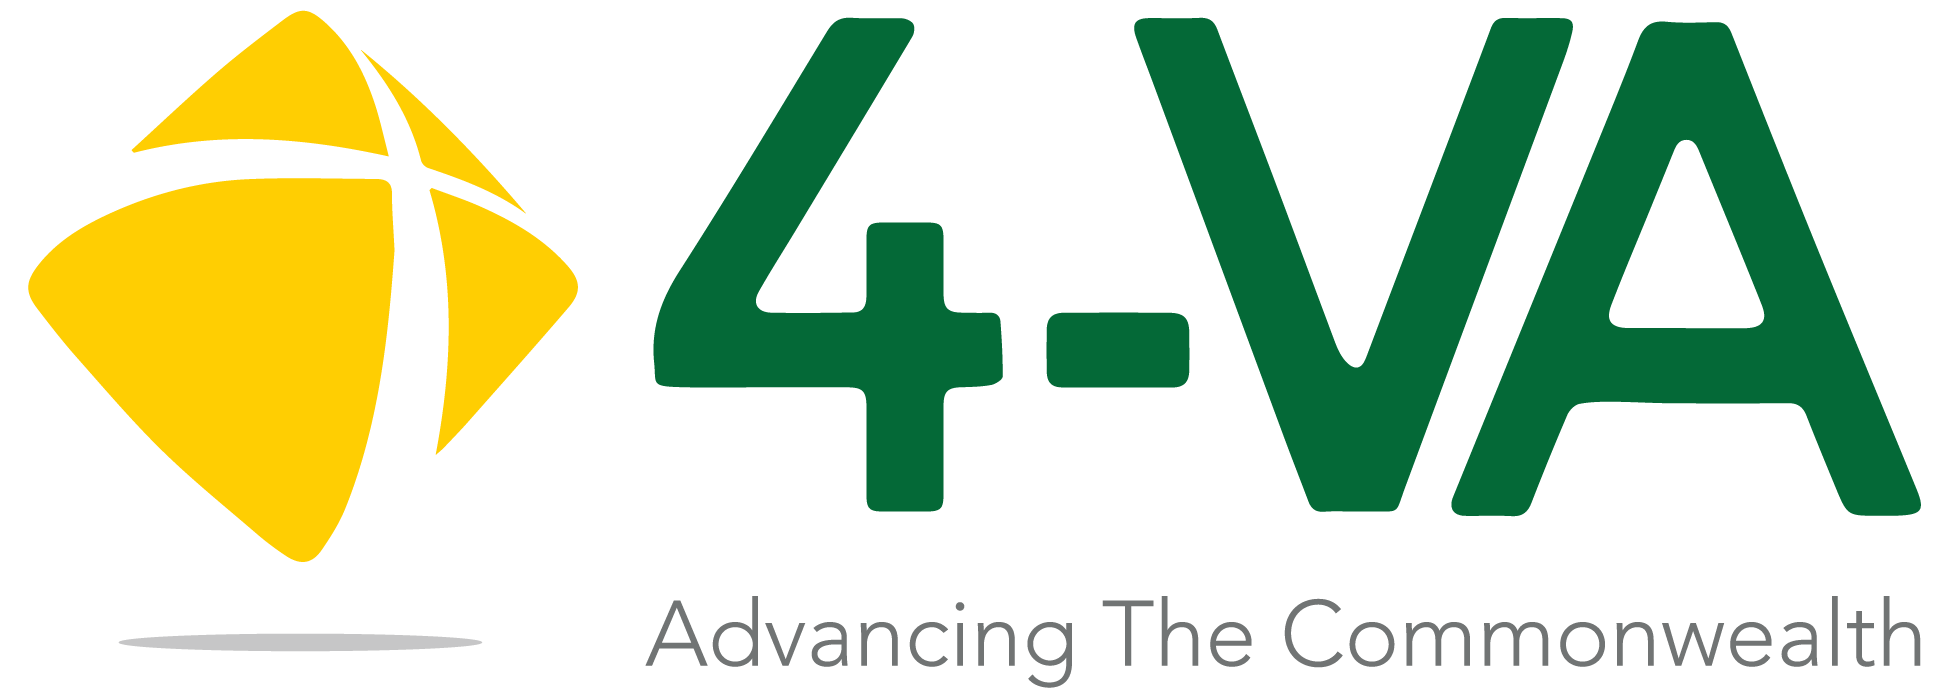 Mason-4VA programs